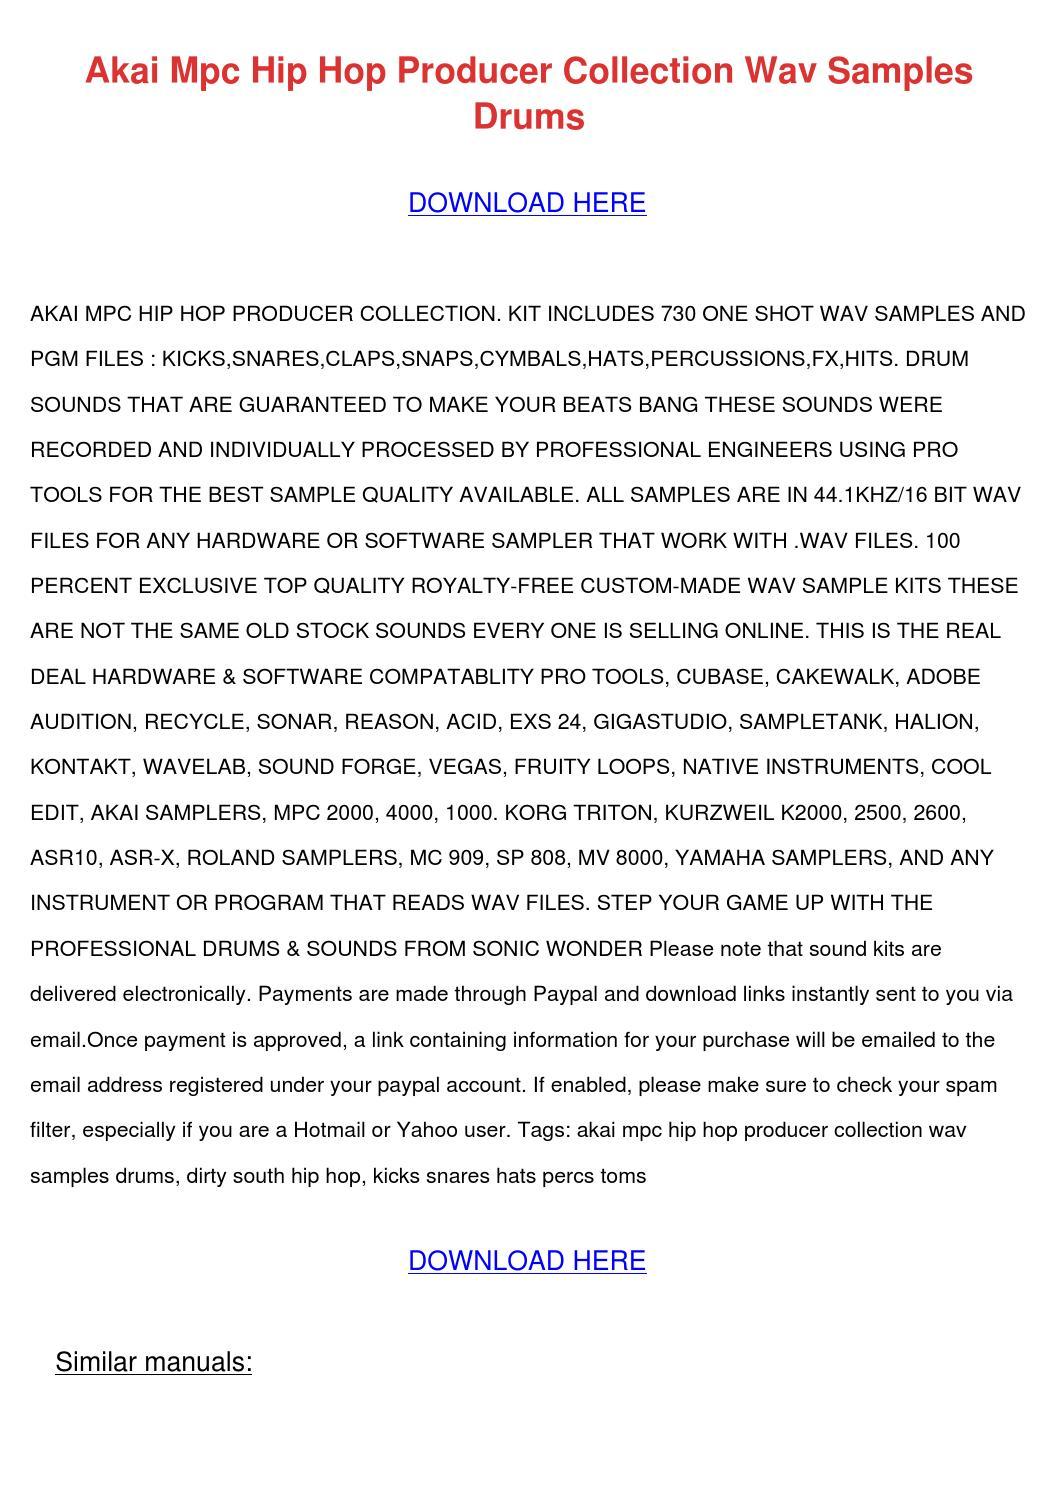 Akai Mpc Hip Hop Producer Collection Wav Samp by